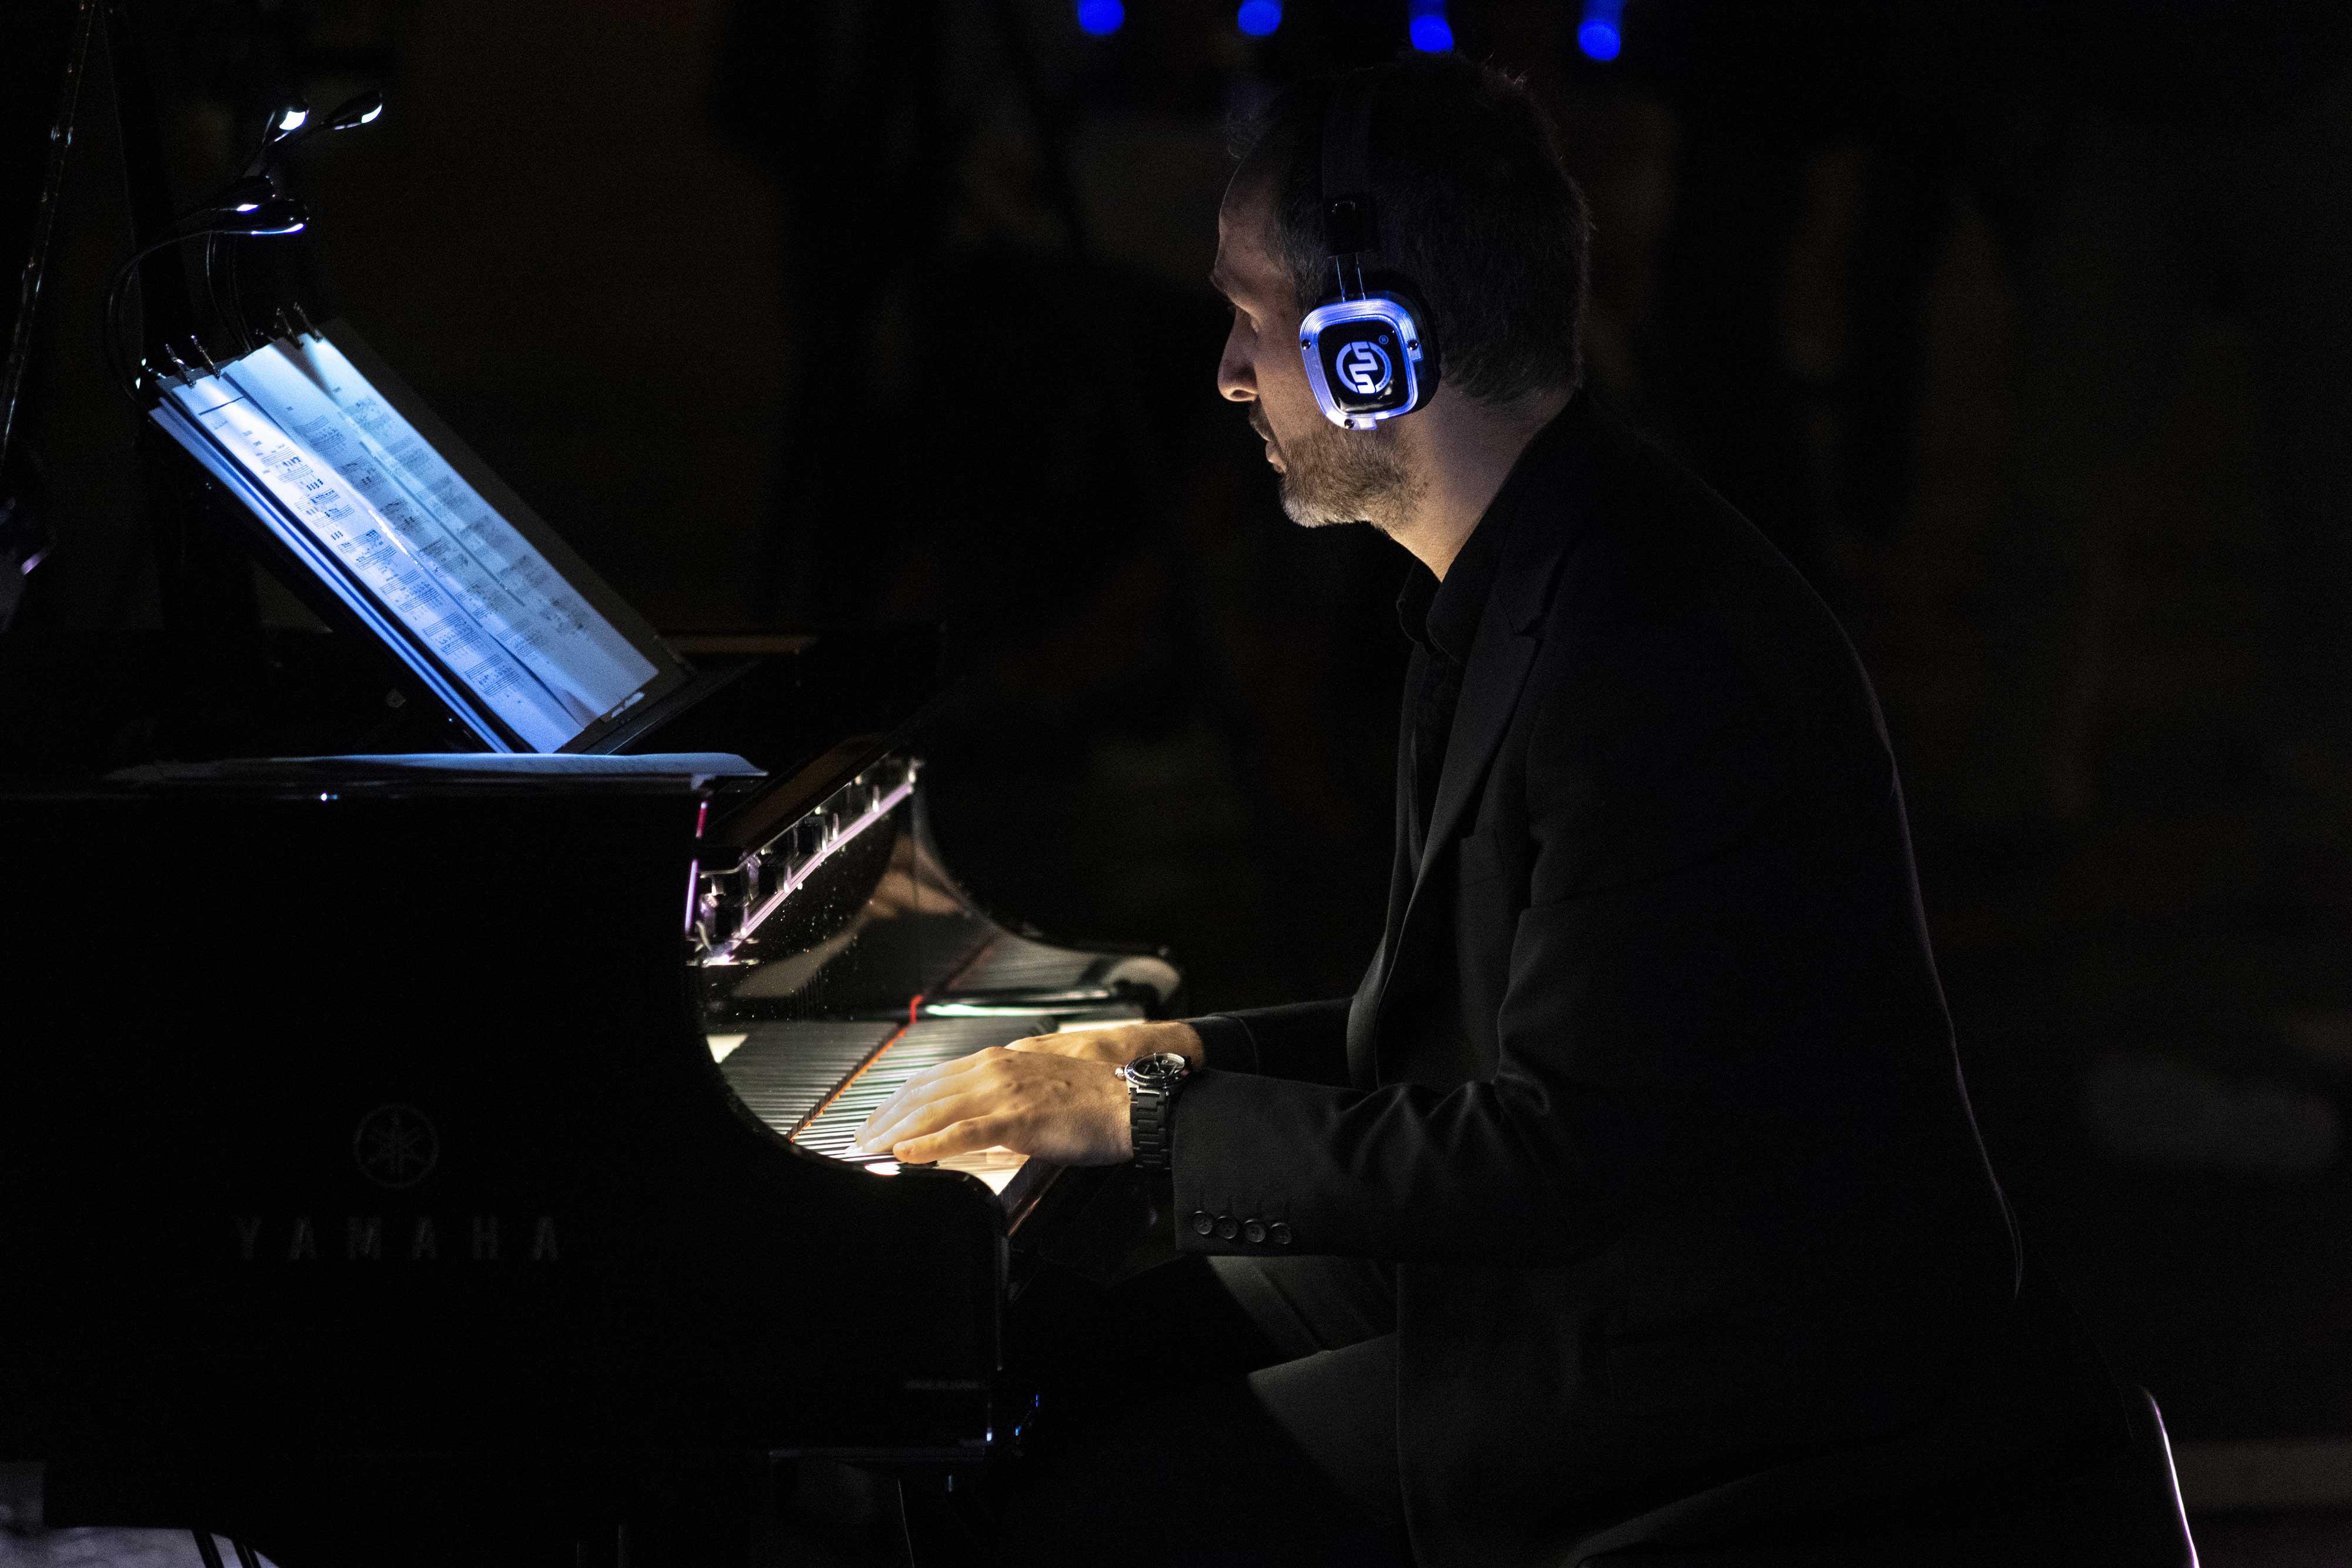 Silent Wifi Concert - Andrea Vizzini